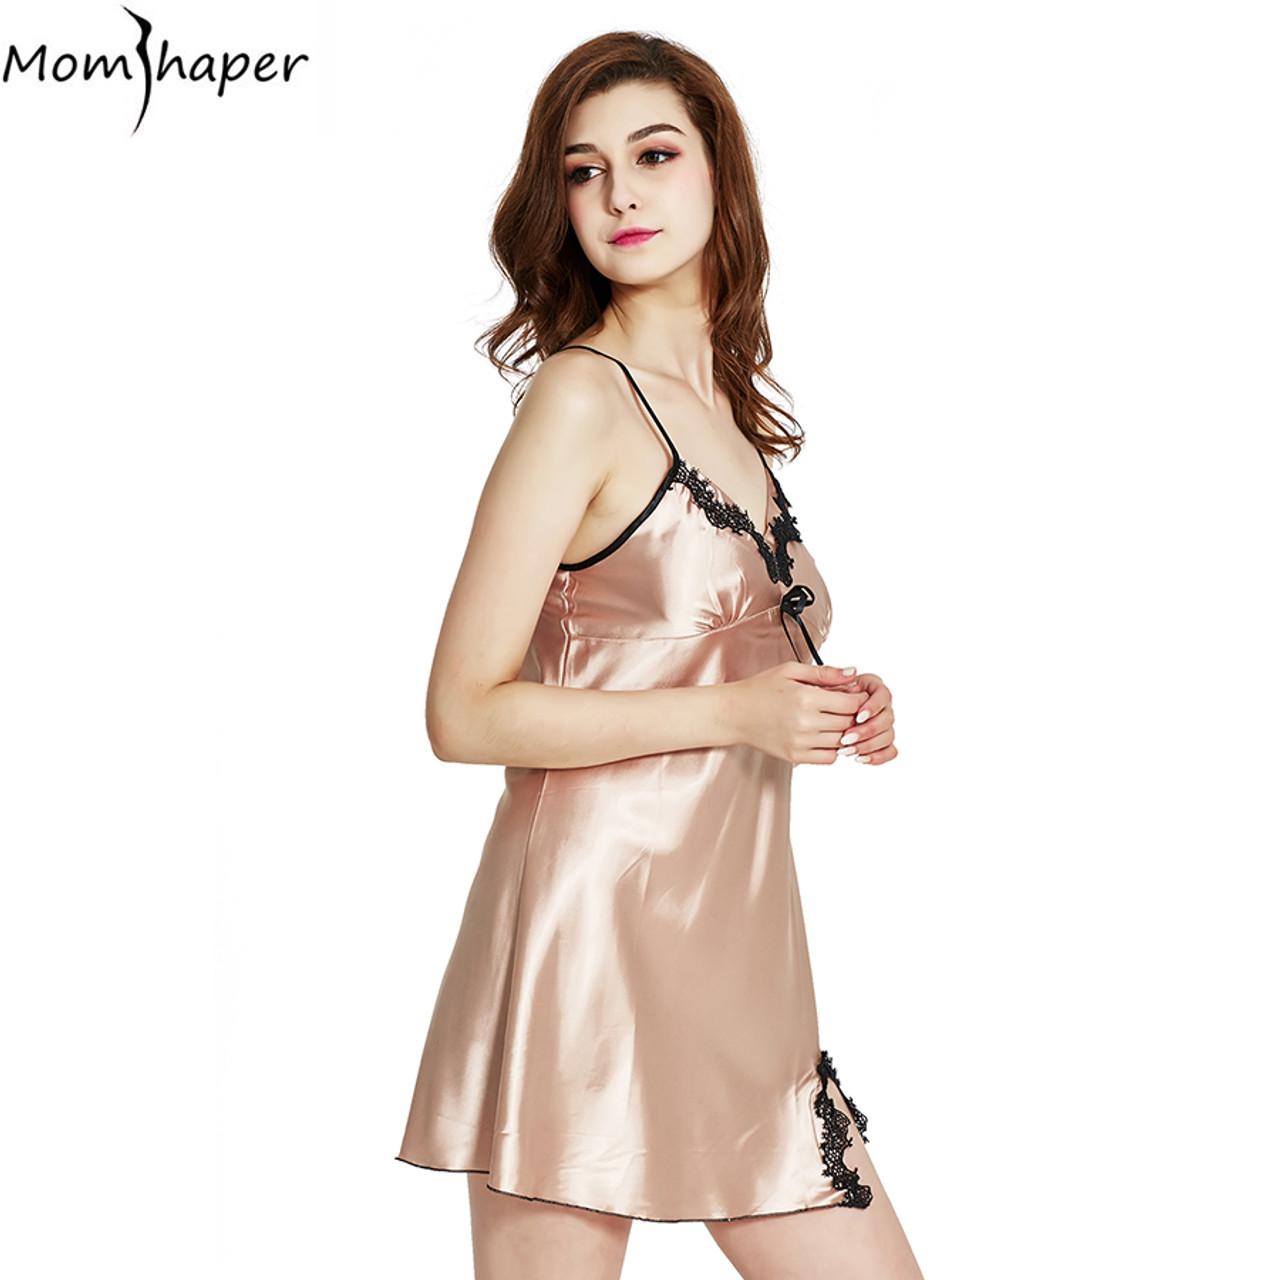 ... Sleepwear pyjamas women Home Clothing Nightgowns Lace robe V-neck  Nightgown Silk Satin Night Dress ... 75a2481dd